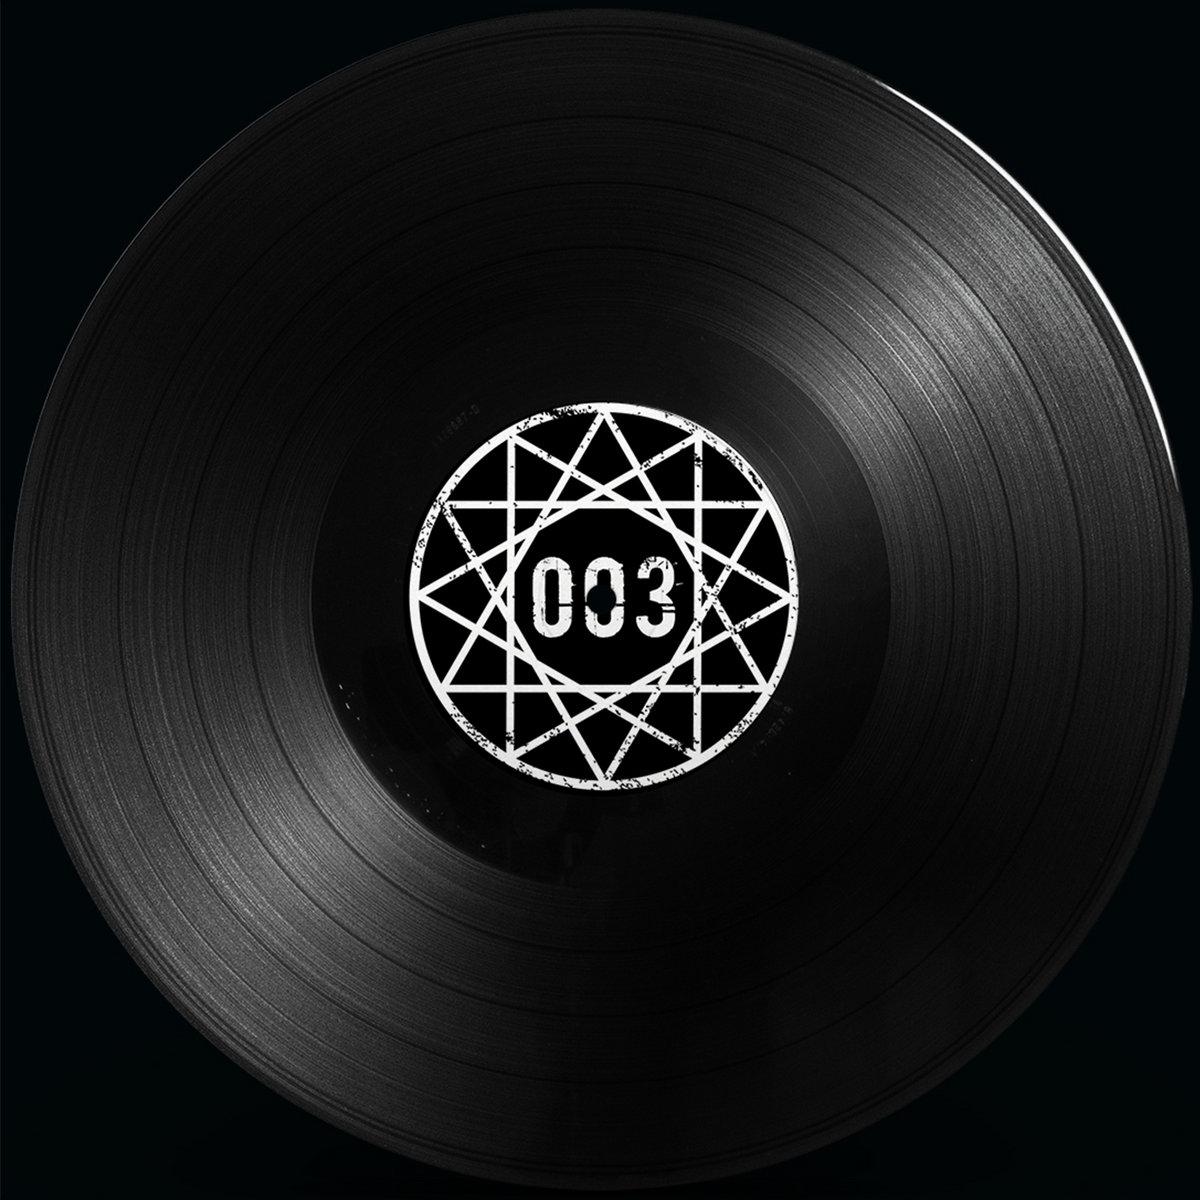 ego death the internet mp3 download